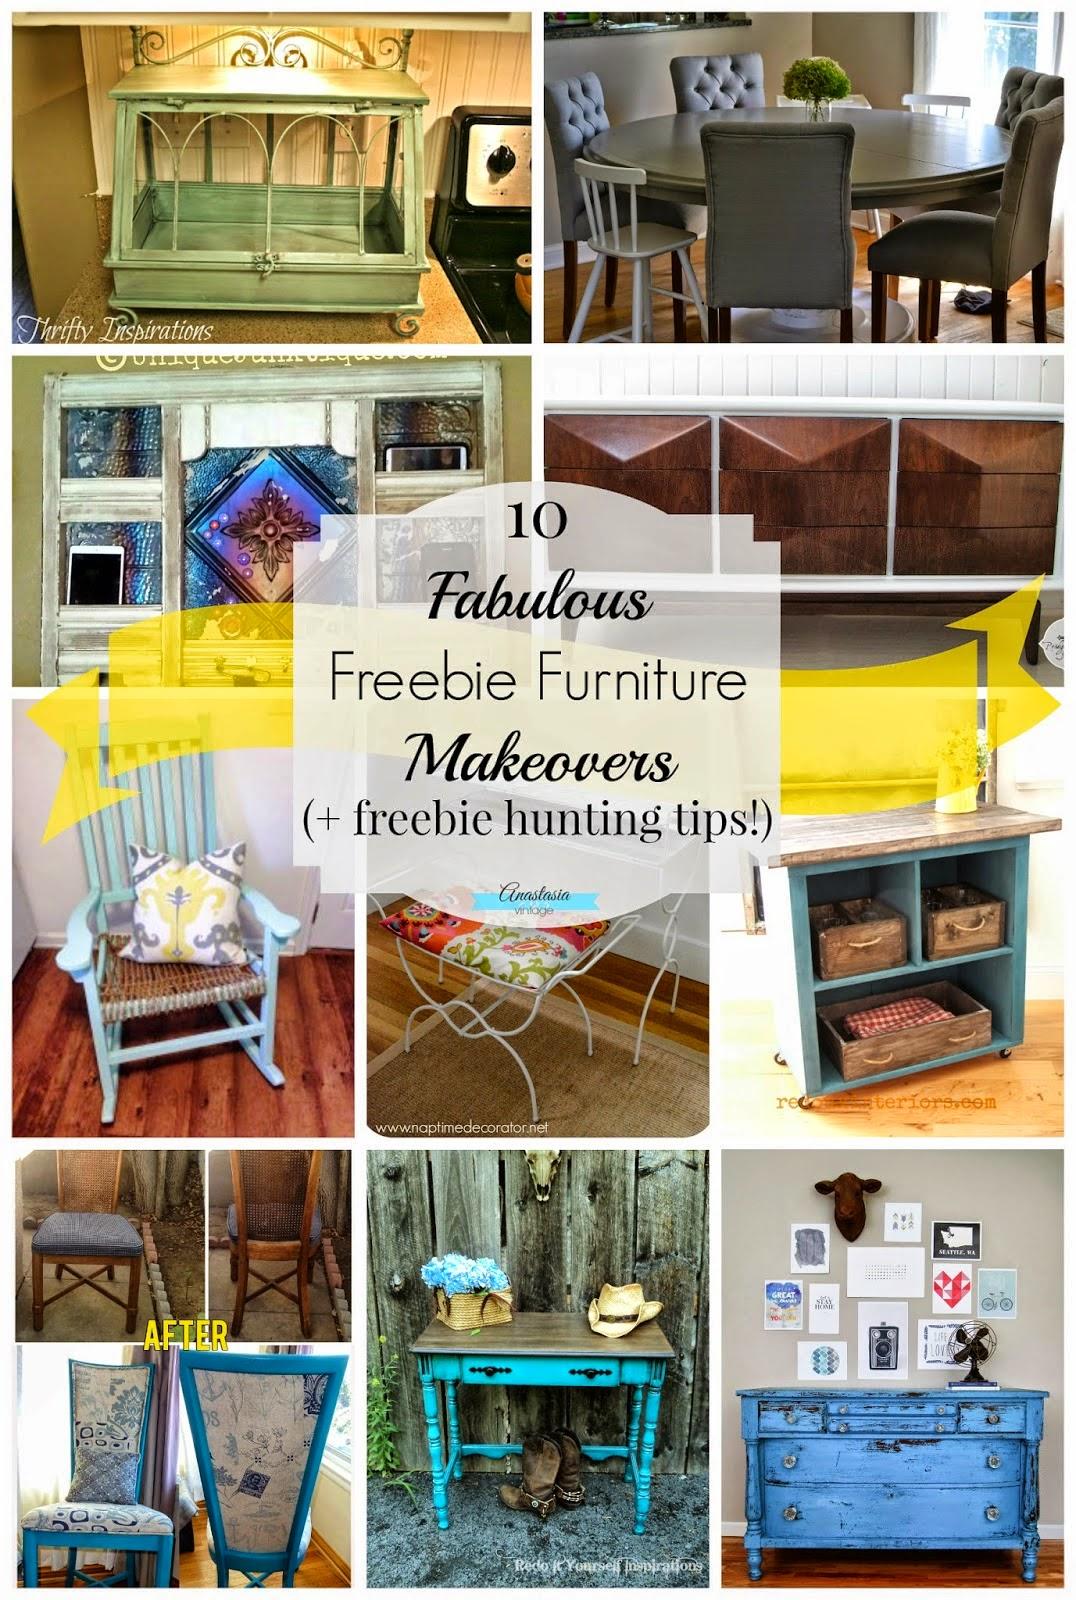 http://anastasiavintagehome.blogspot.ca/2014/11/10-fabulous-freebie-furniture-makeovers.html